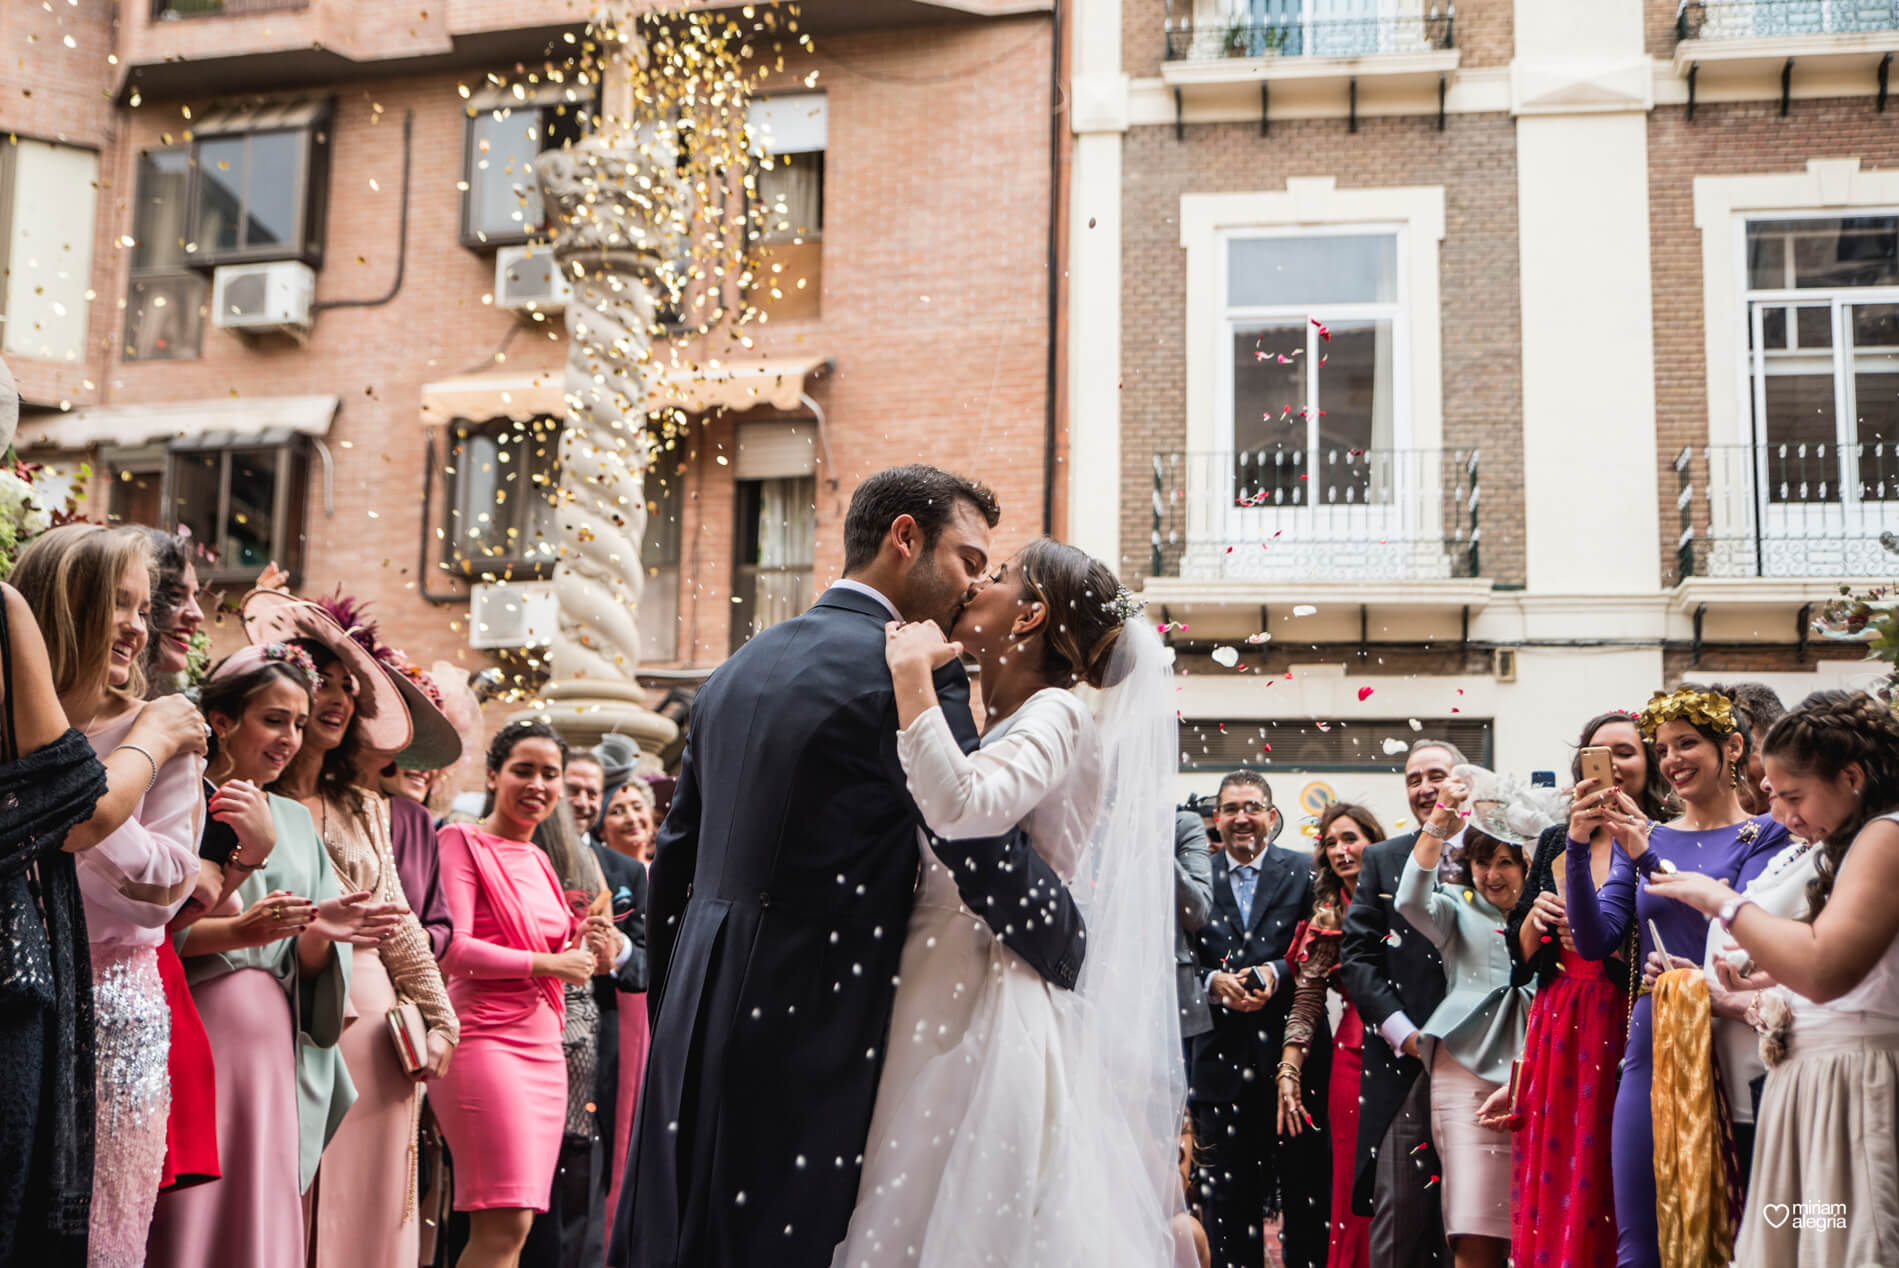 vestido-de-novia-paula-del-vas-miriam-alegria-fotografos-boda-murcia-185